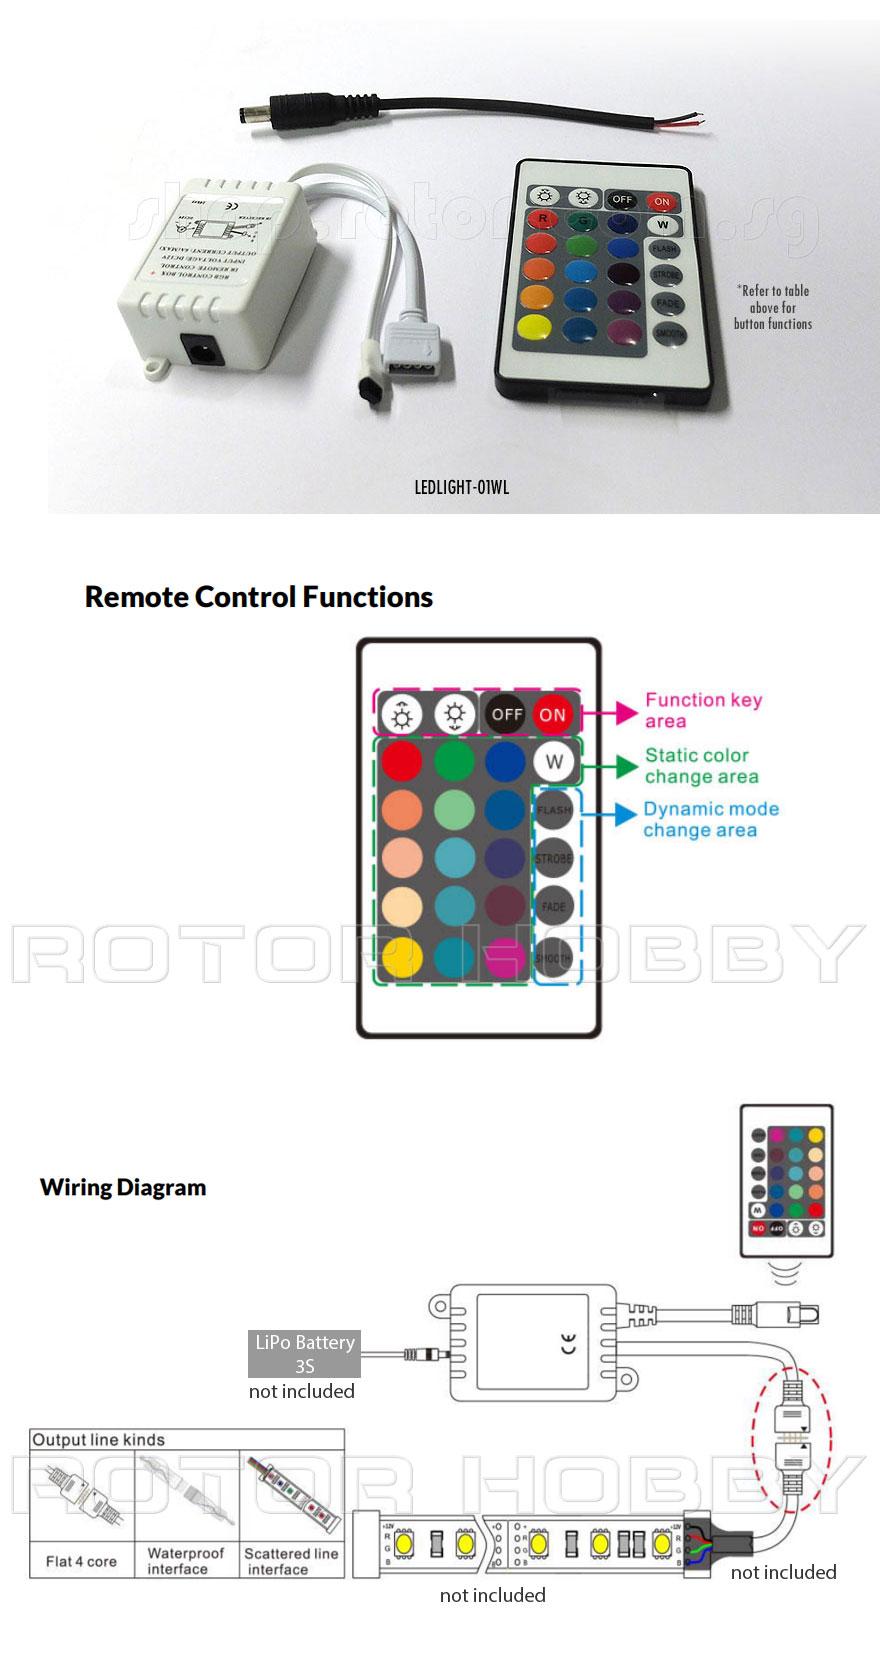 HXK WIRELESS Colour Control Device for multi-colour SMD LED Light Strips